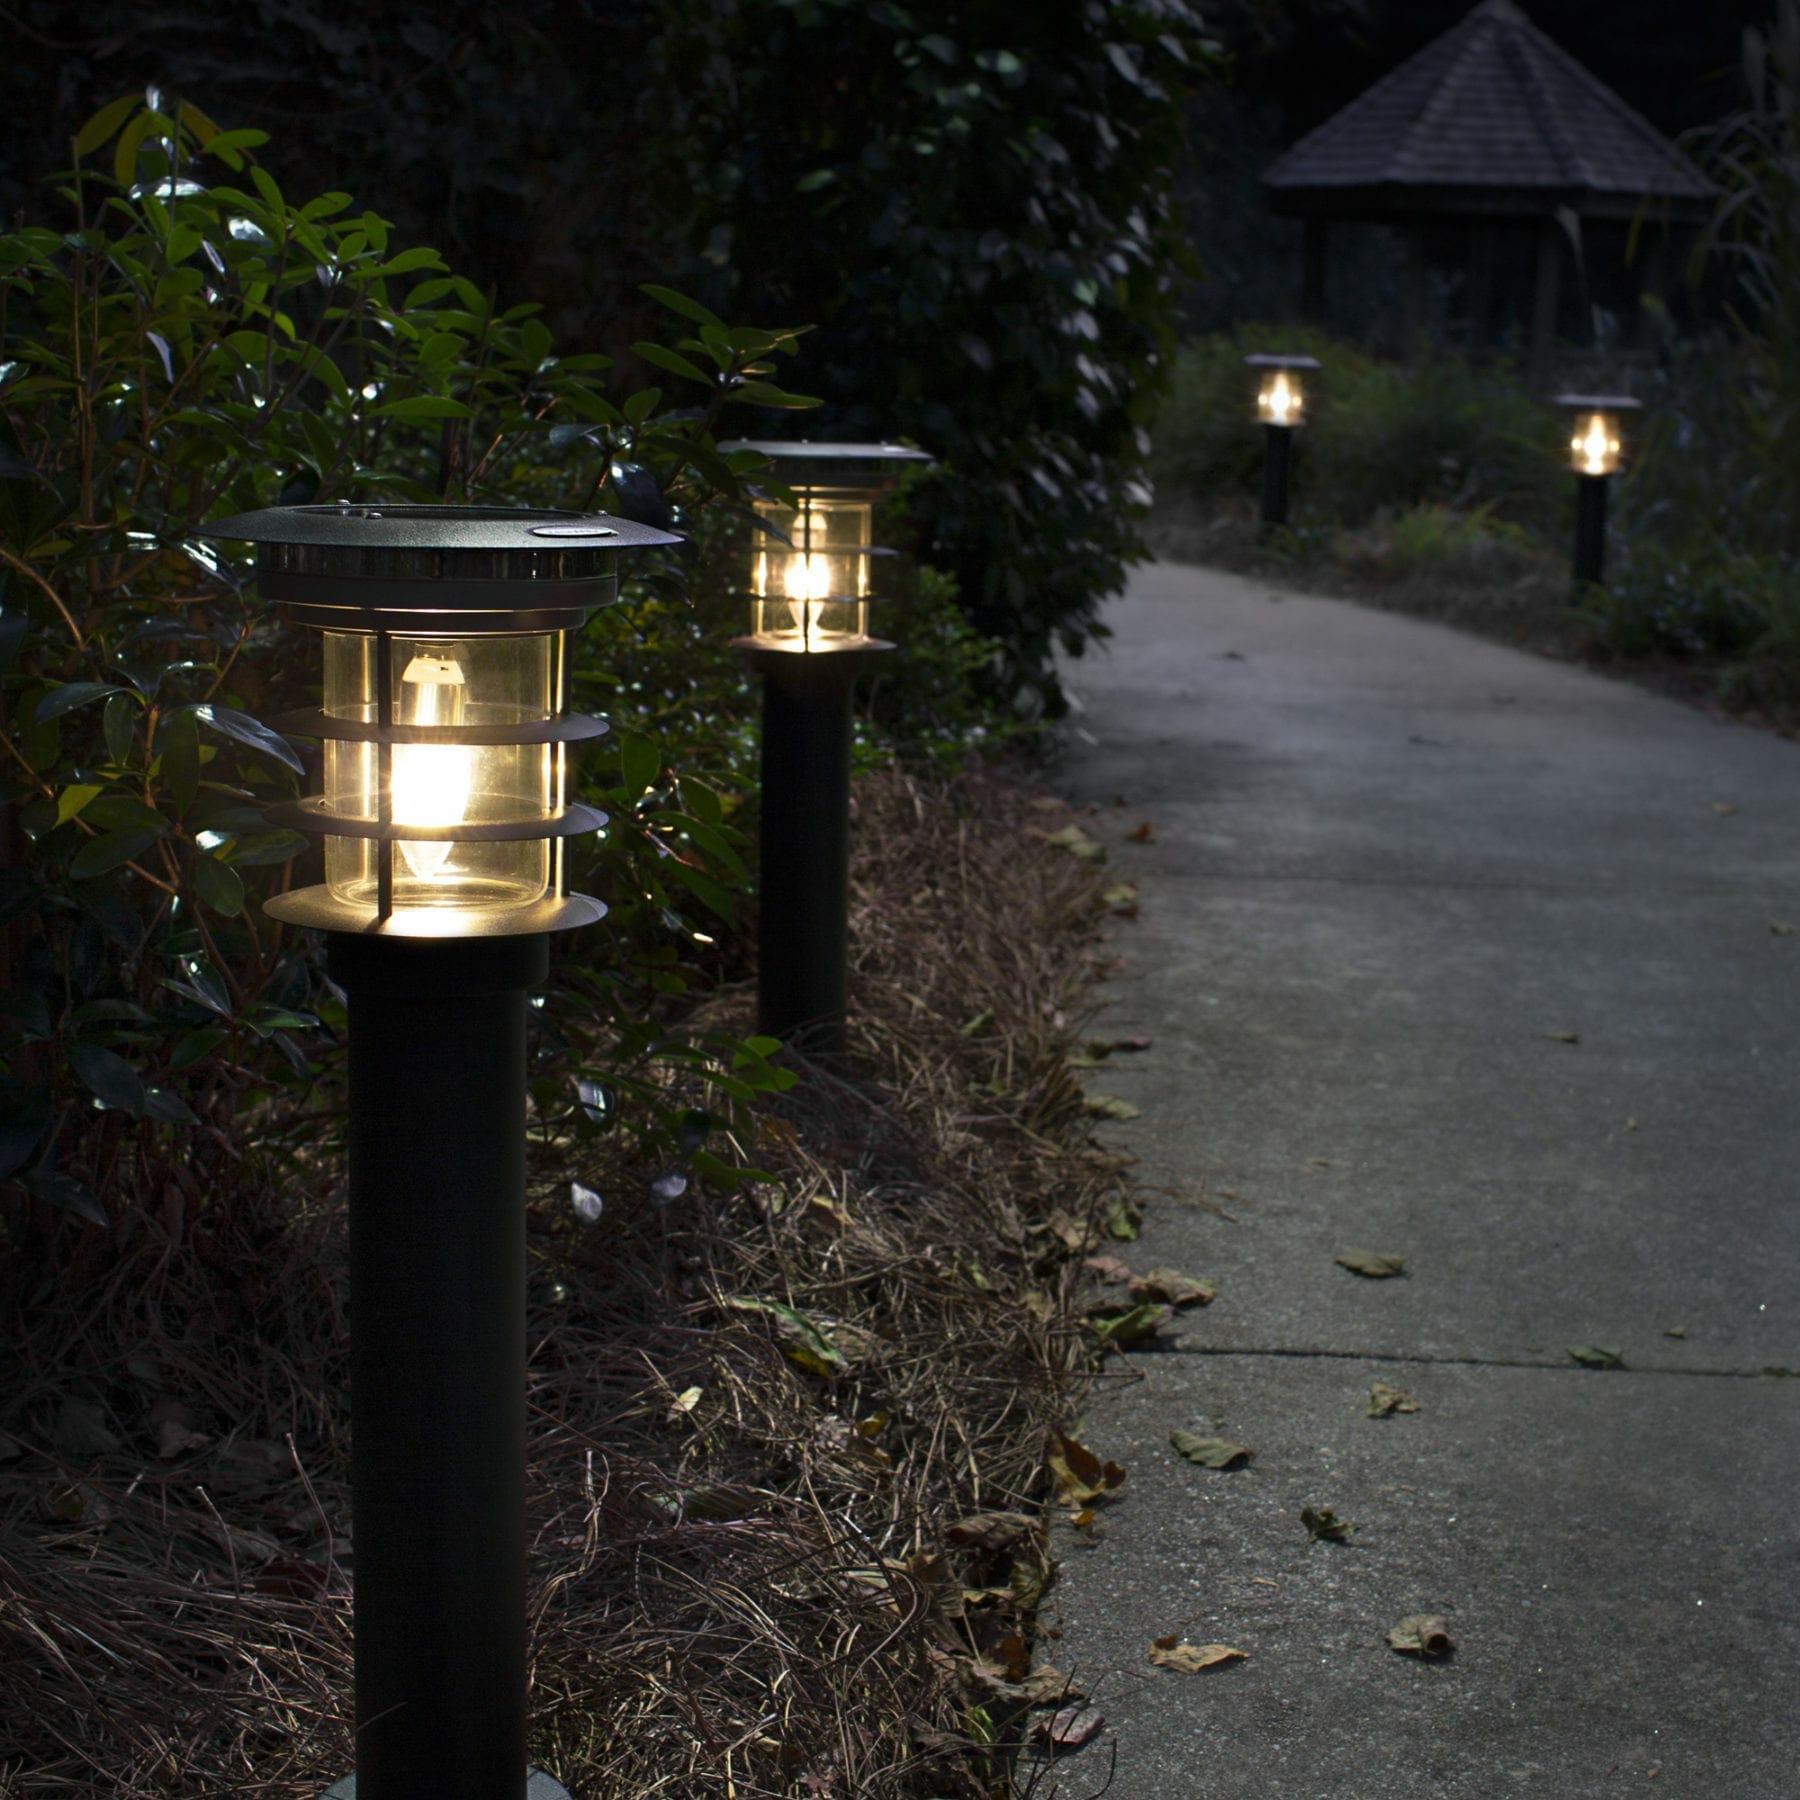 Stainless Steel Path Light - Black